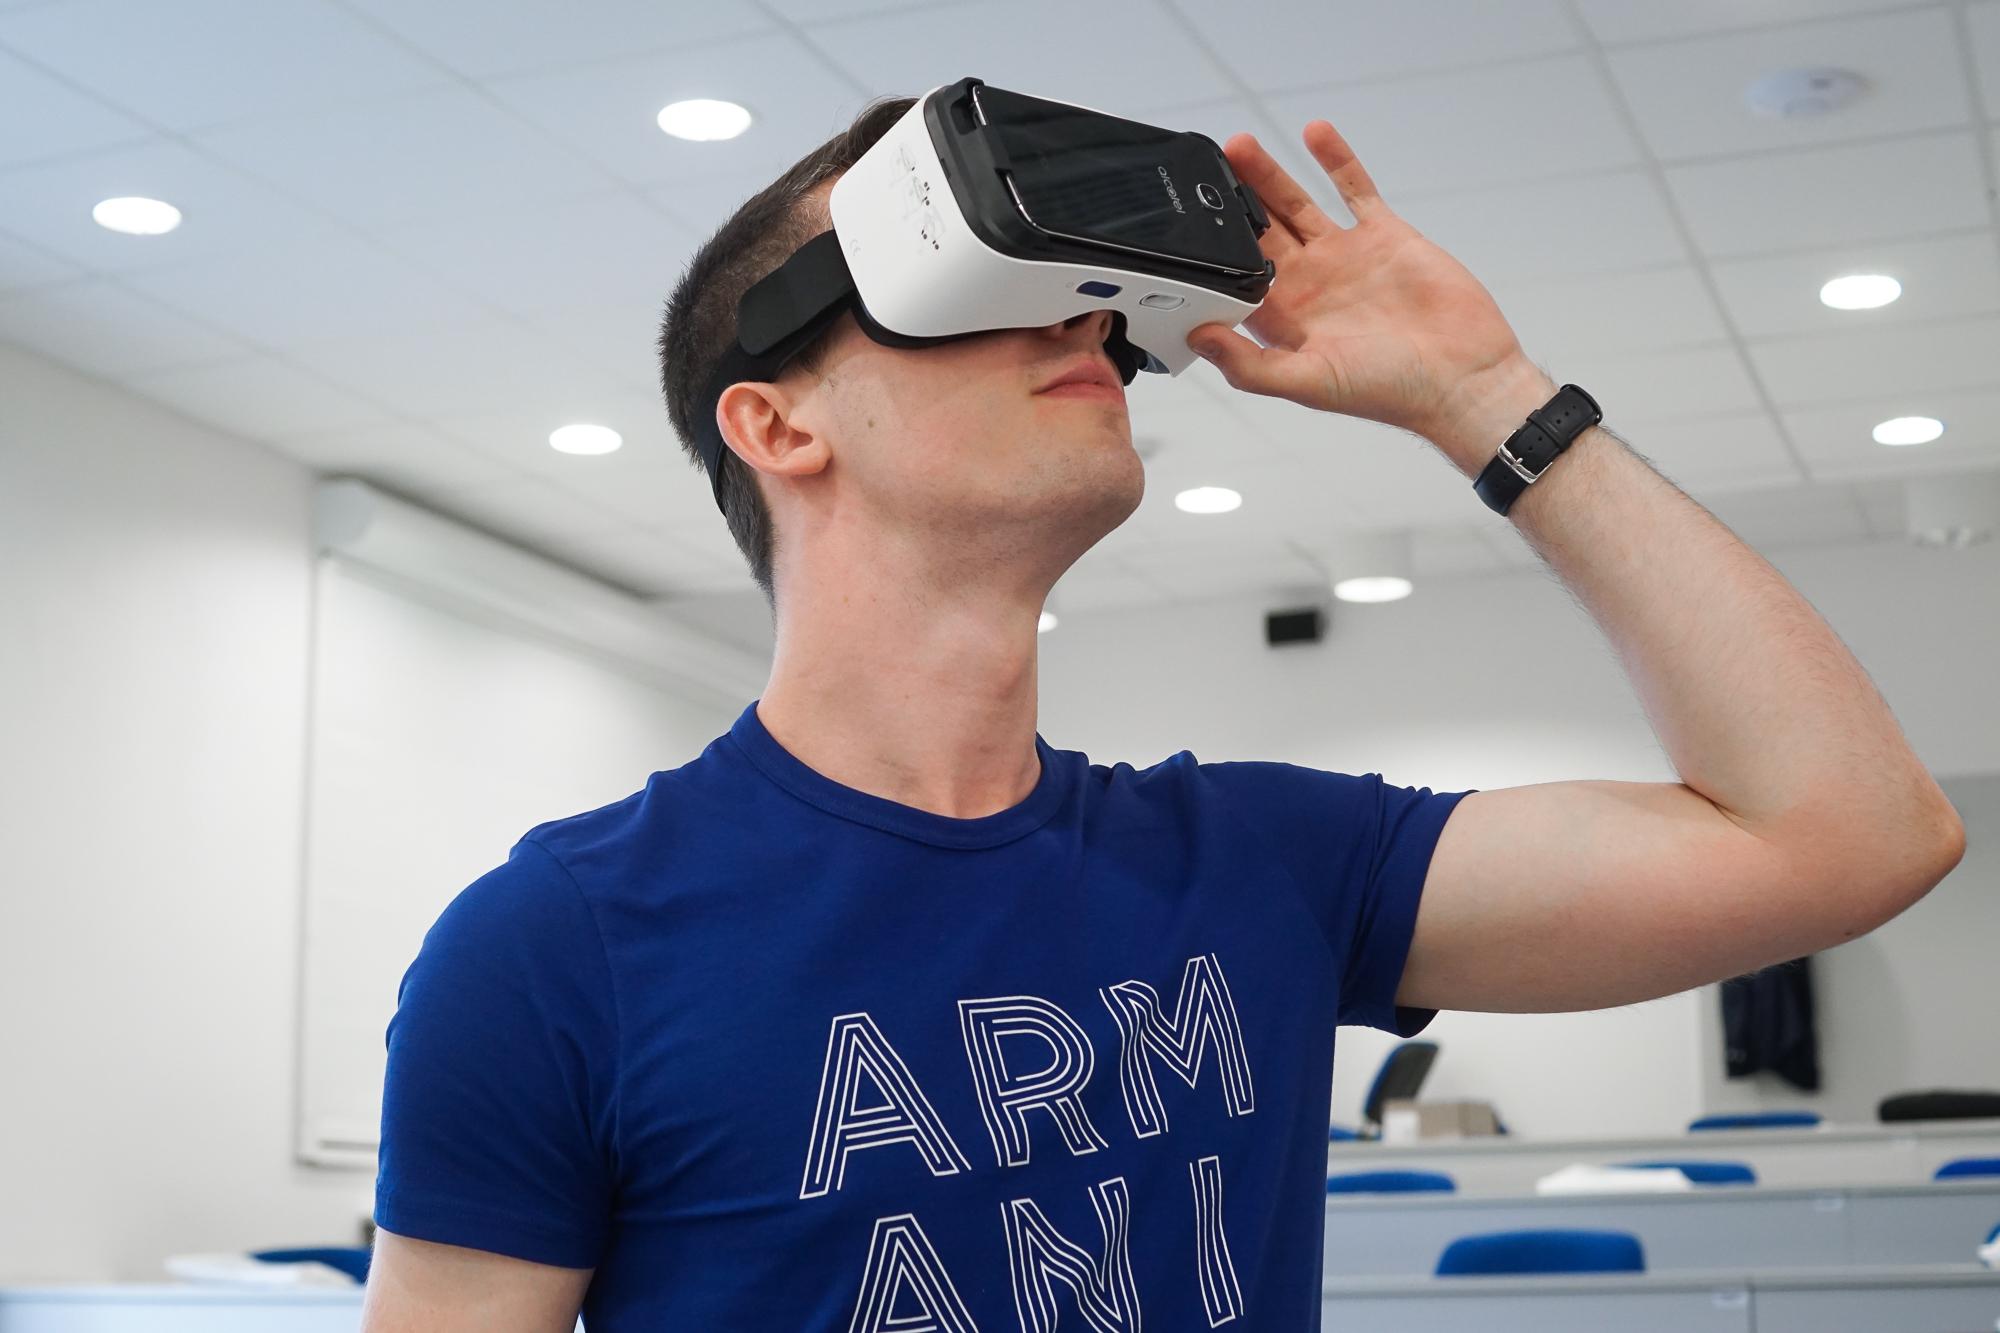 petr-vocelka-virtualni-realita